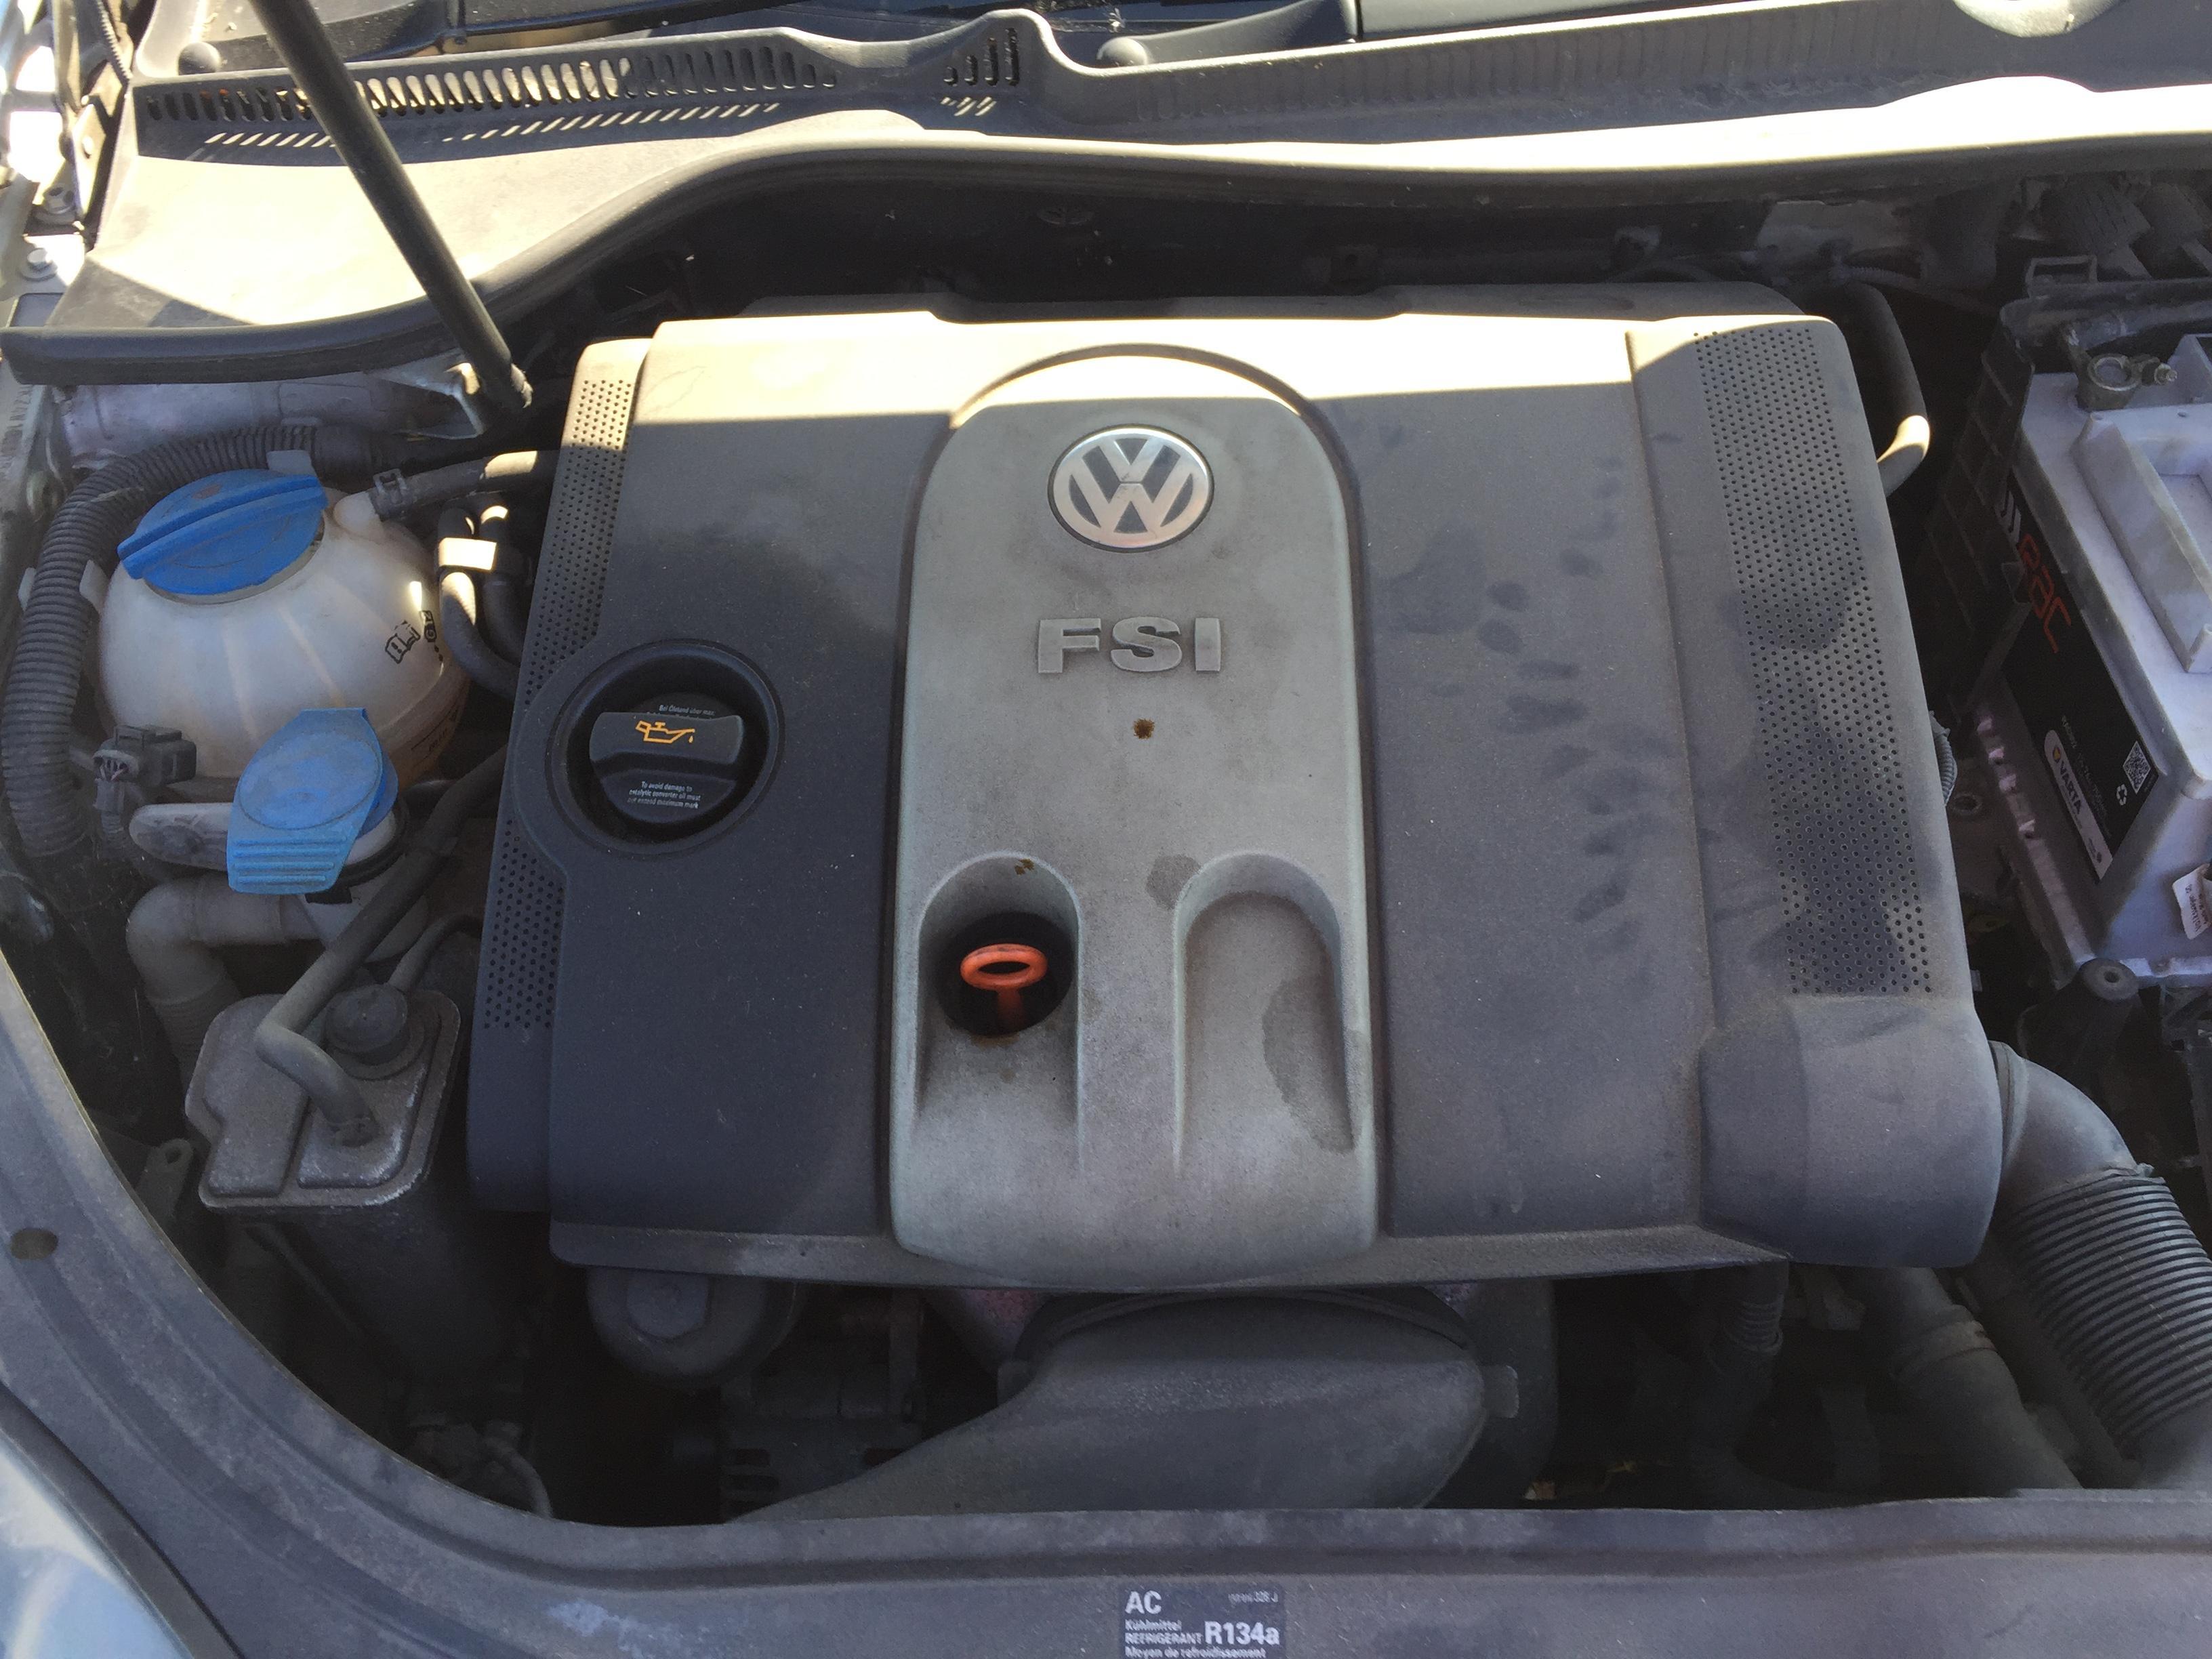 Used Car Parts Foto 3 Volkswagen GOLF 2004 1.6 Mechanical Hatchback 4/5 d. Silver 2017-8-30 A3429